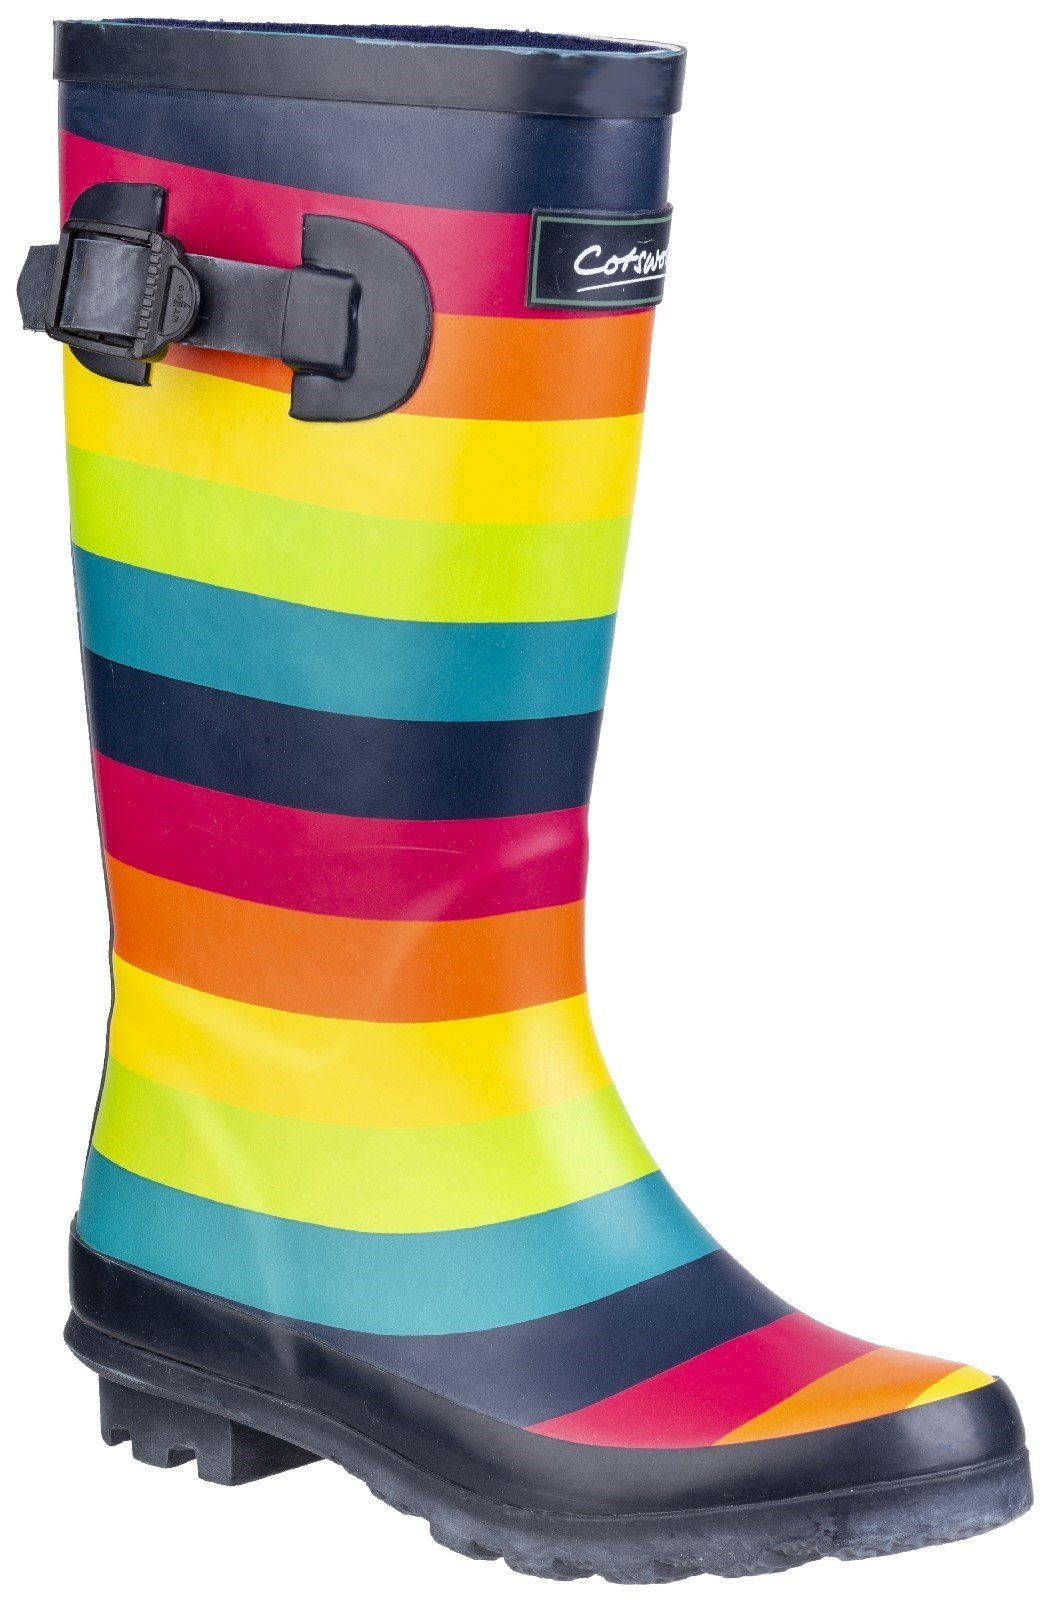 Cotswold Kid's Rainbow Wellington Boot Multicolor 27180 - Multicoloured 8